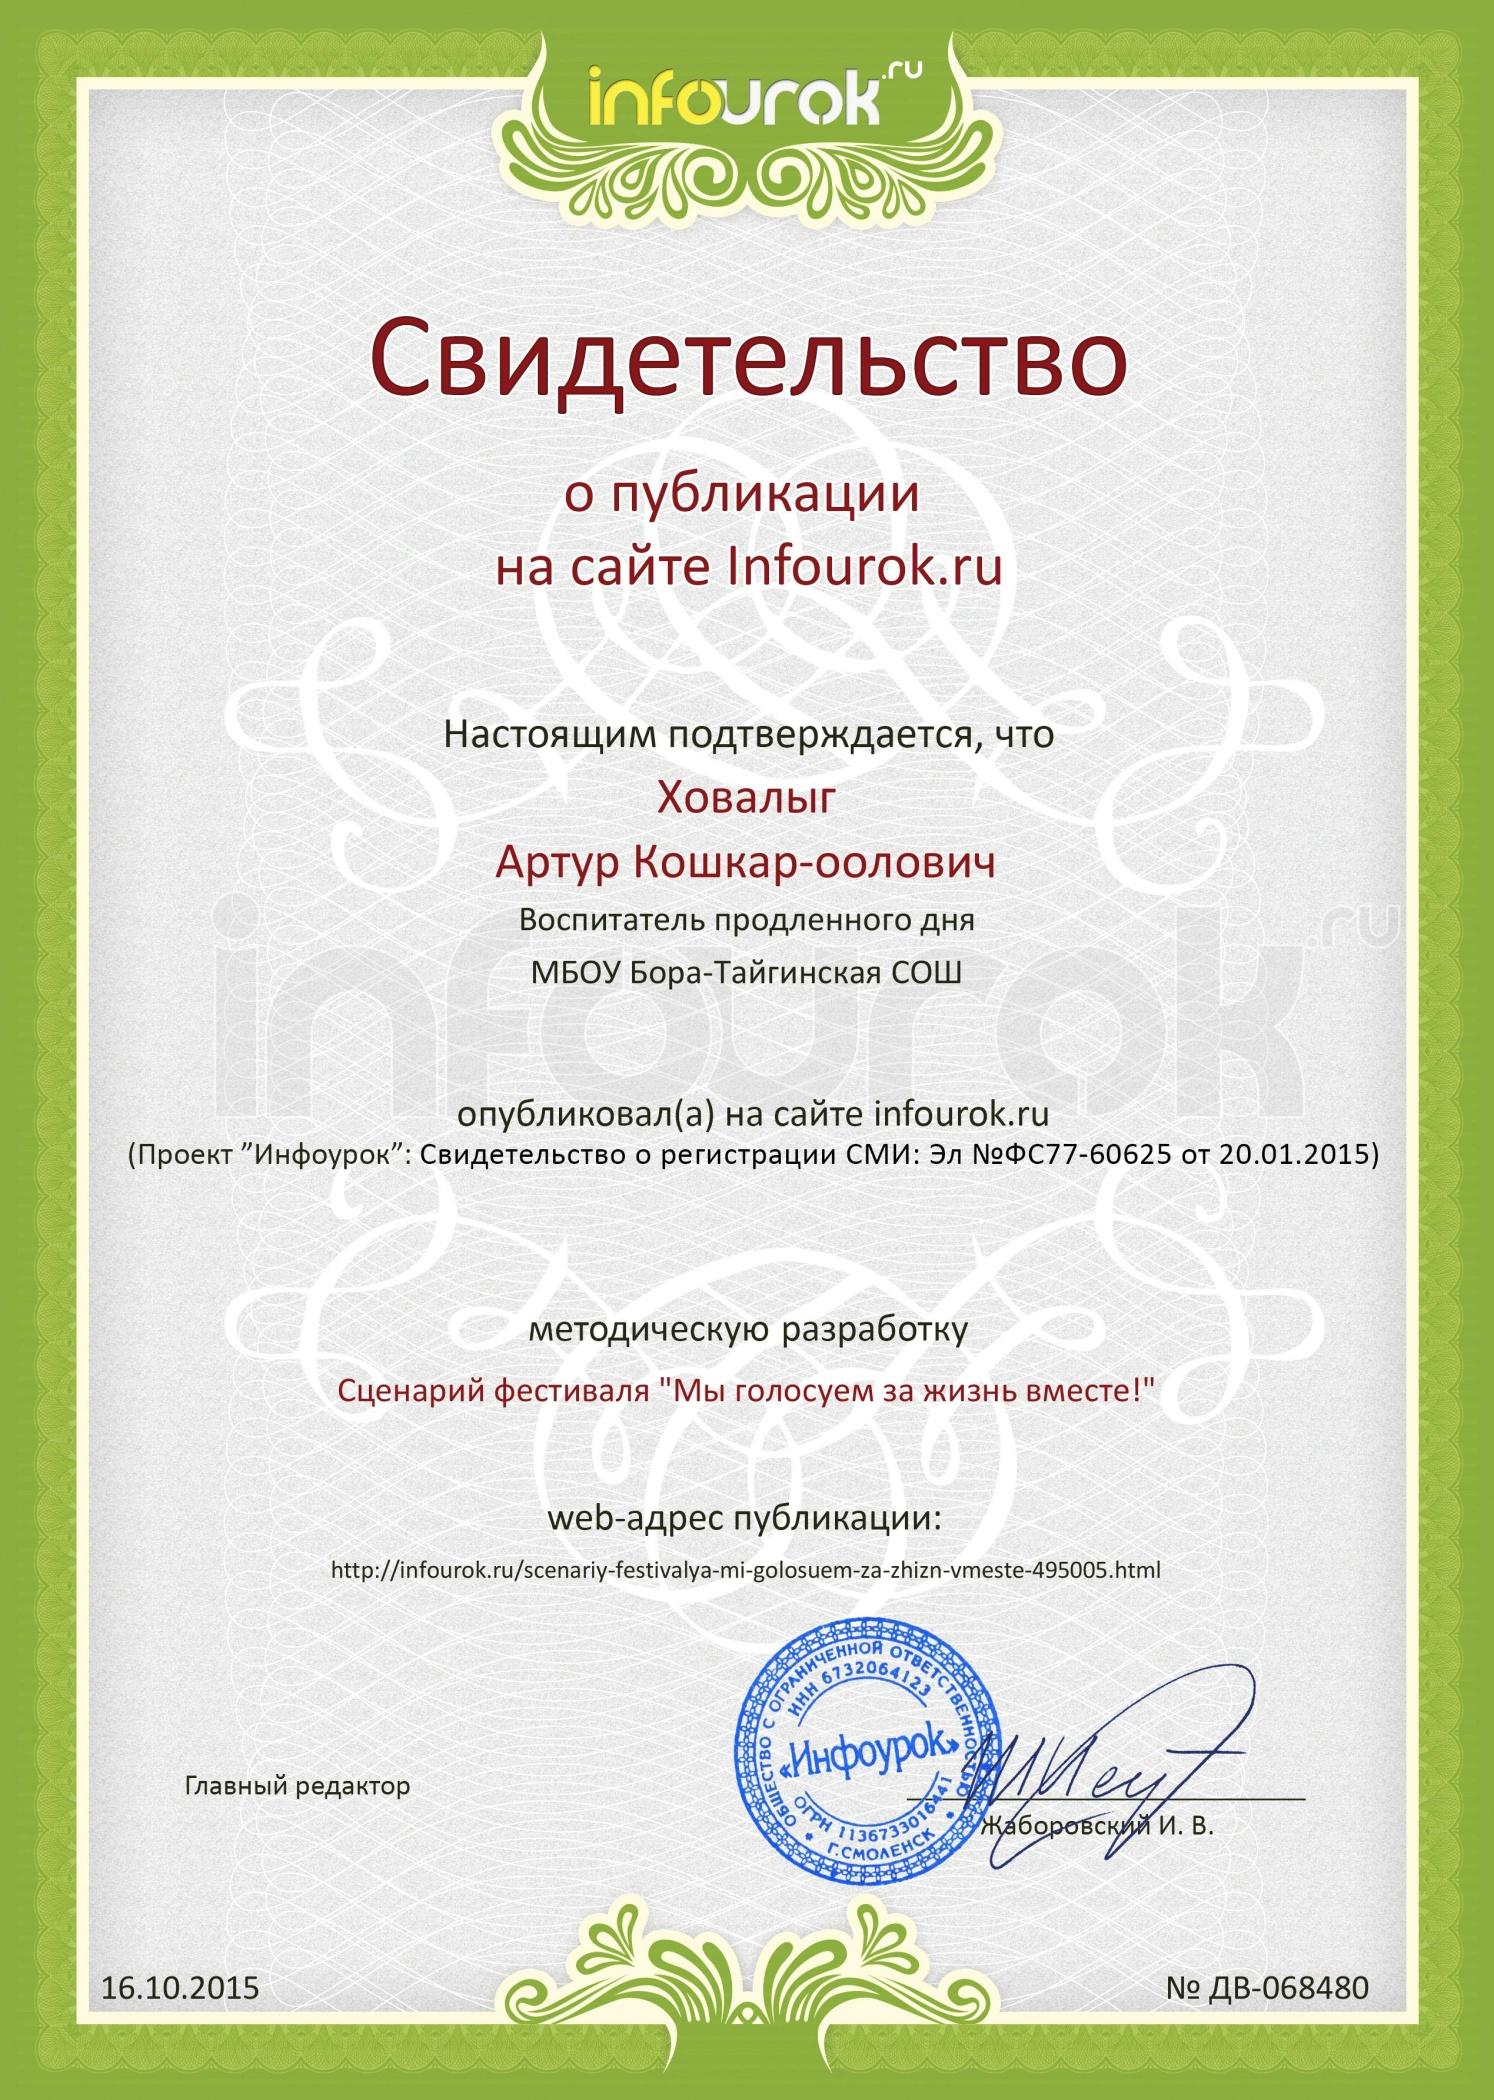 C:\Users\2015\Downloads\Сертификат проекта Infourok.ru № ДВ-068480.jpg